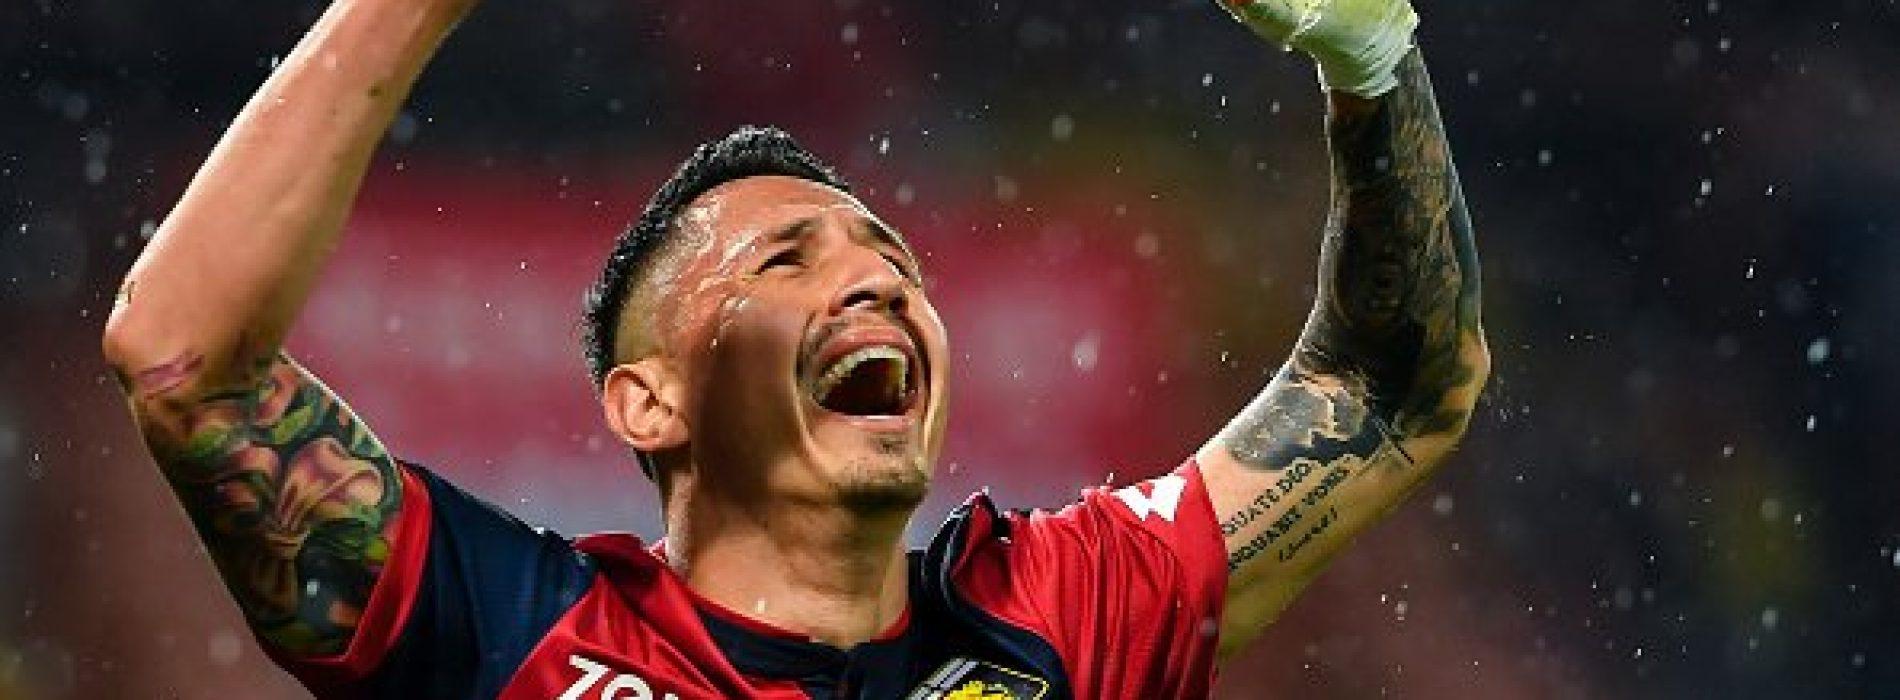 Nazionale Lapadula Peru, l'attaccante vuole La Blanquirroja